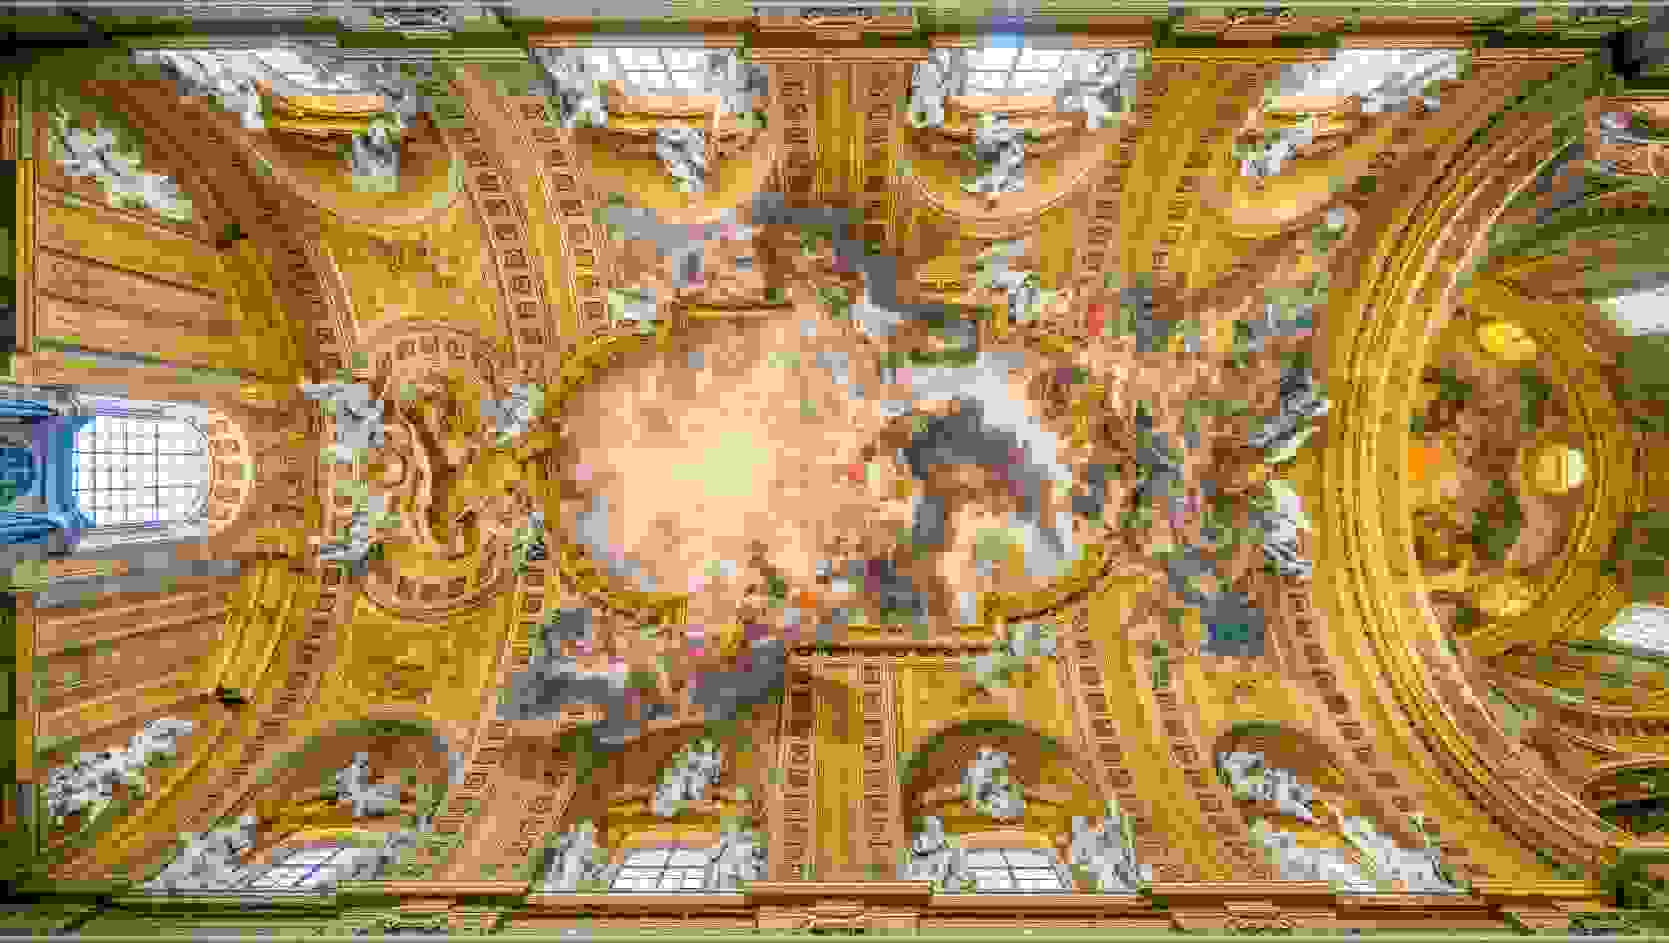 Giacomo Barozzi da Vignola and Giacomo della Porta's Church of the Gesù dome | Source: colosseumrometickets.com